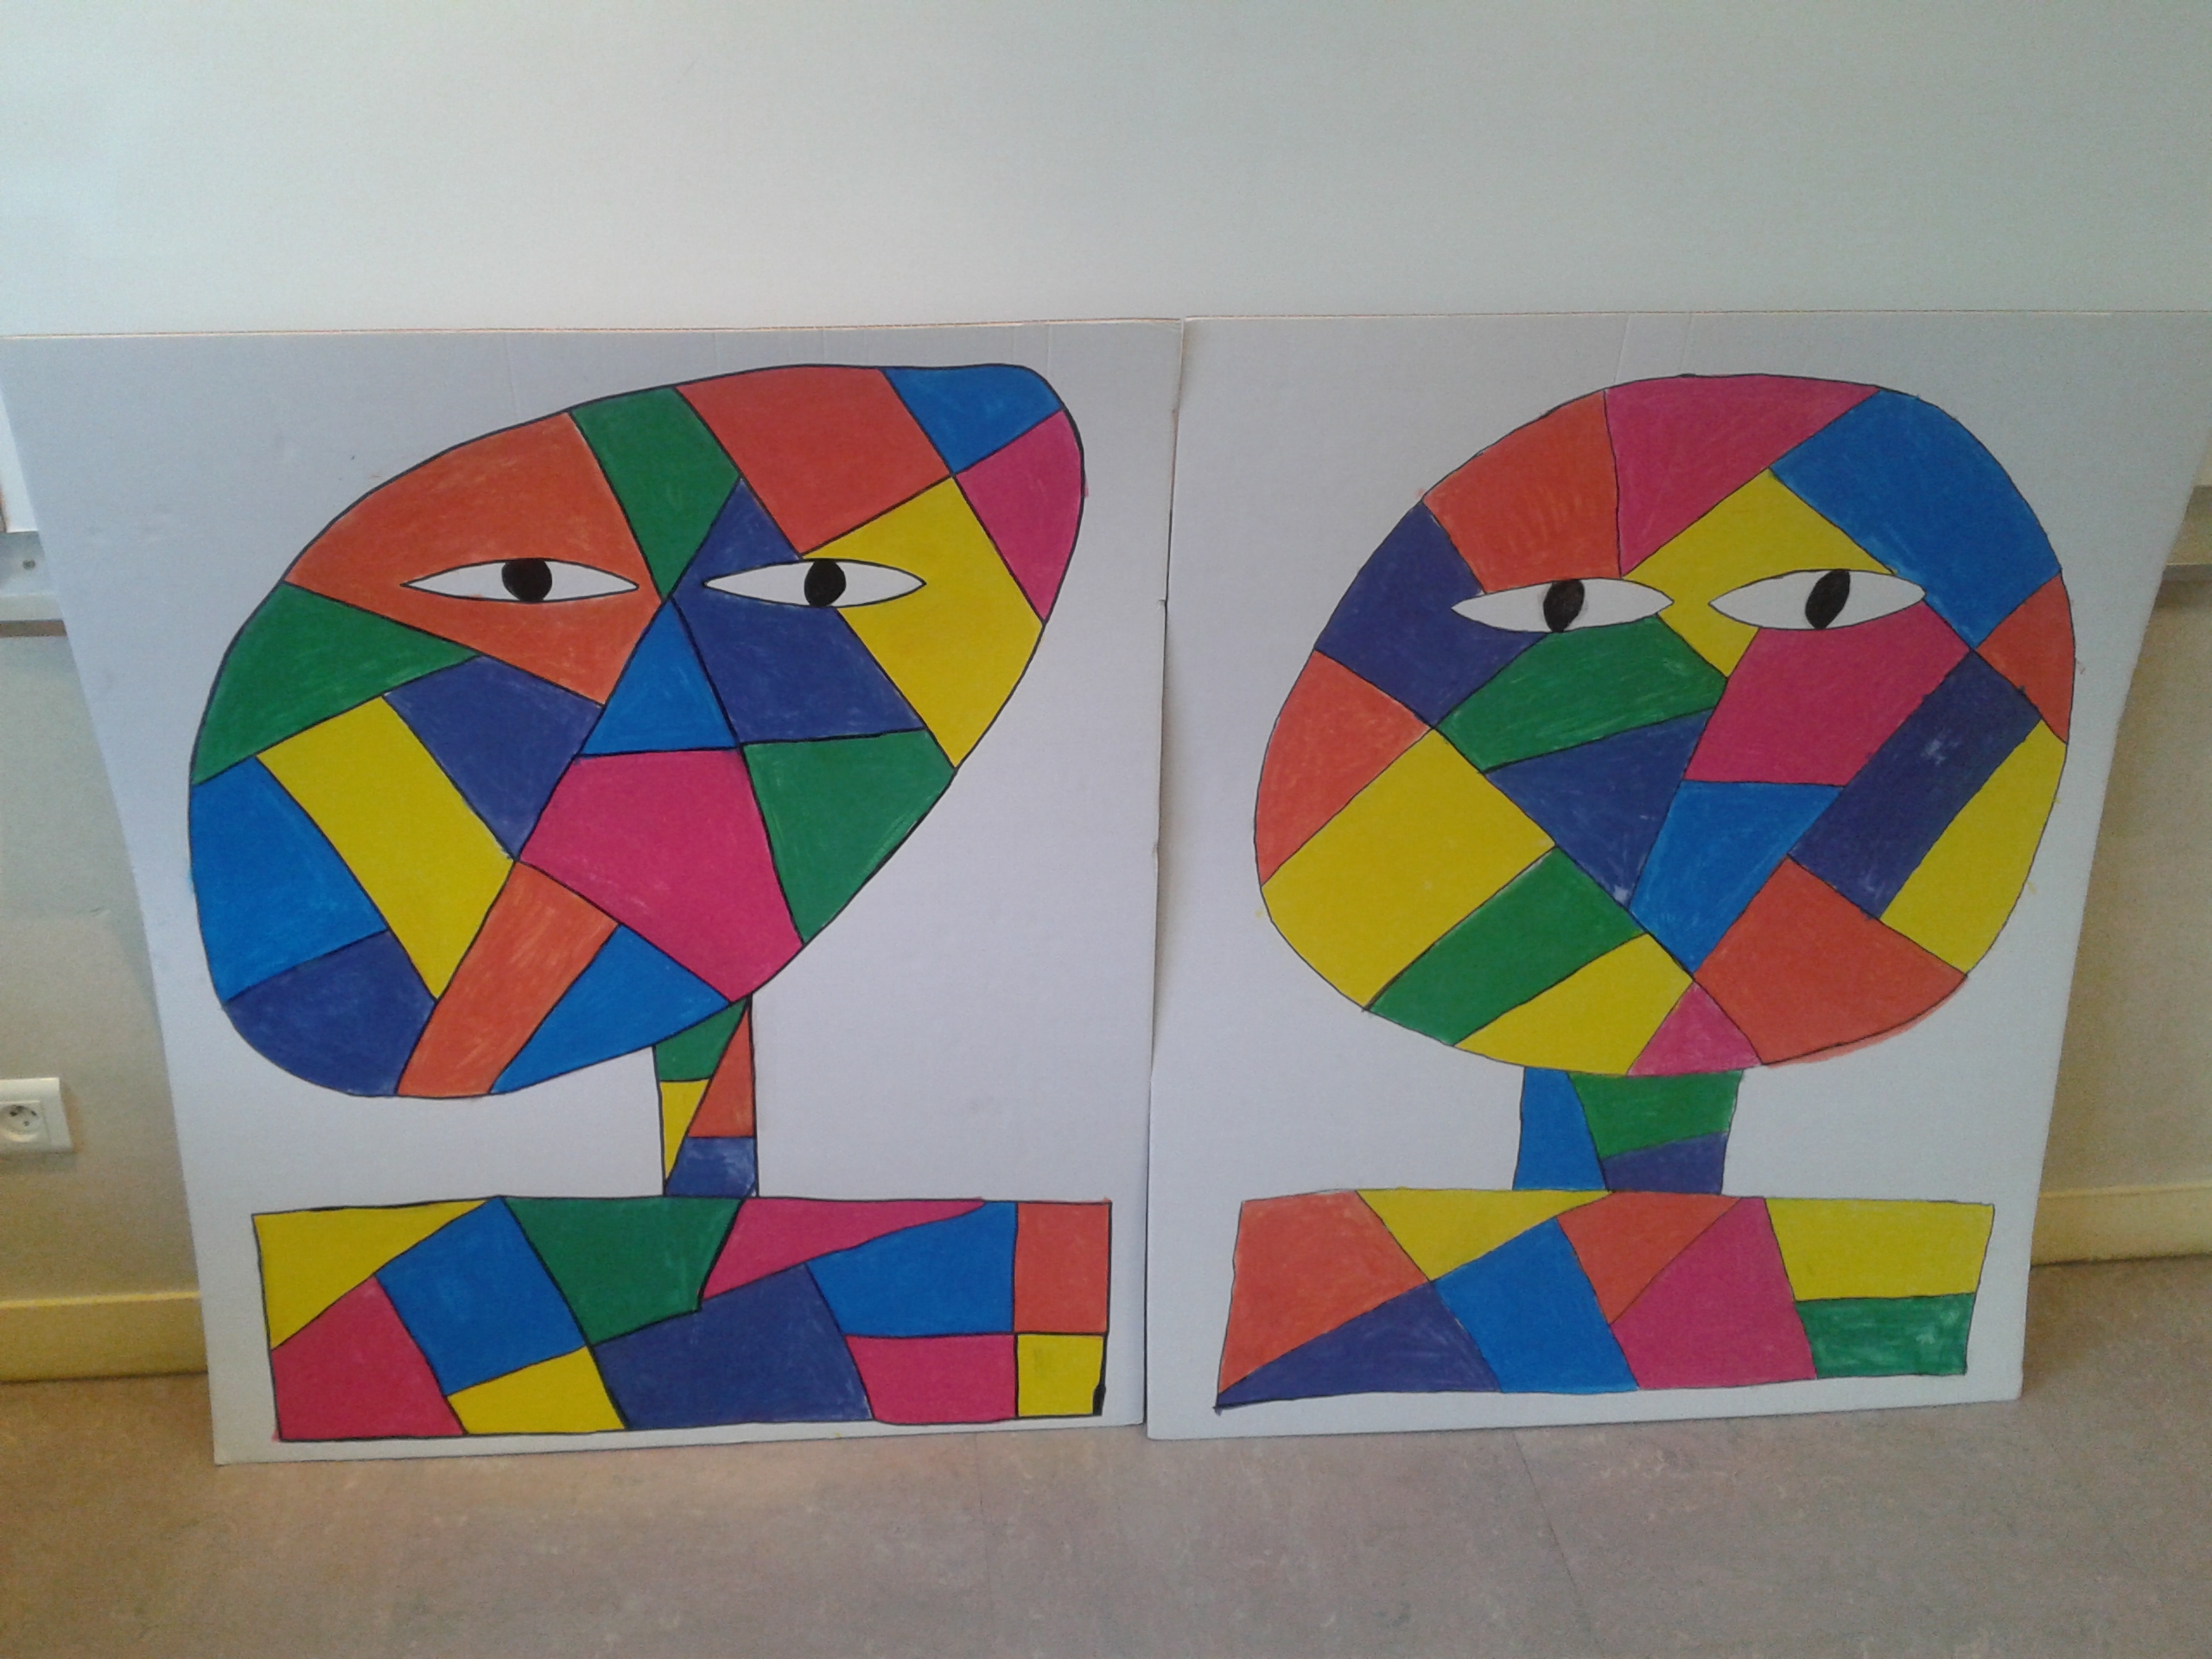 Tableau De Paul Klee La Classe